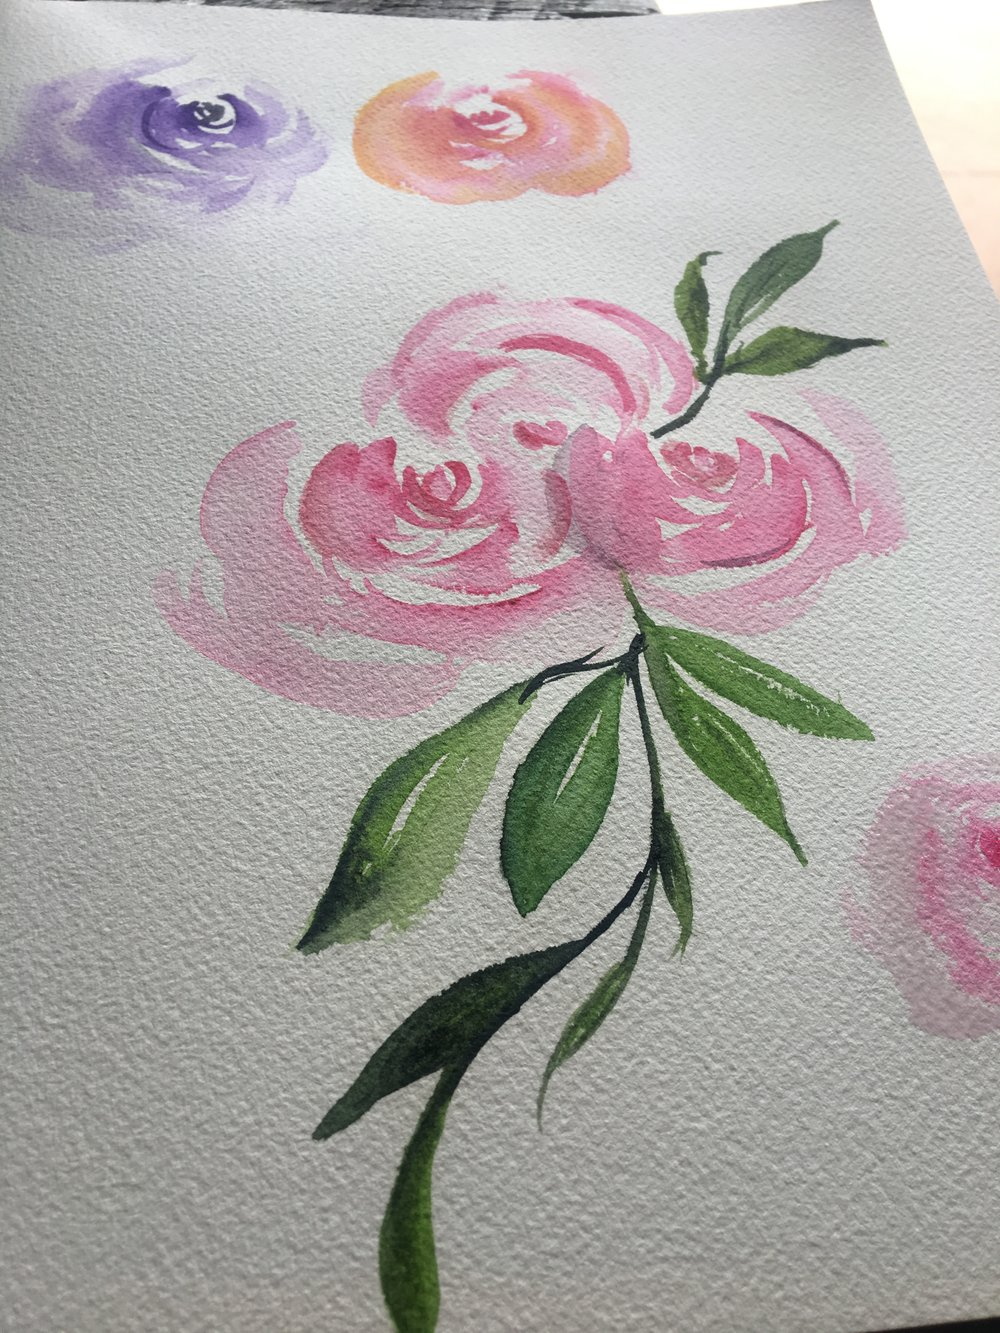 Joy-Unscripted-Calligraphy-Blog-Watercolor-Workshop-171.JPG